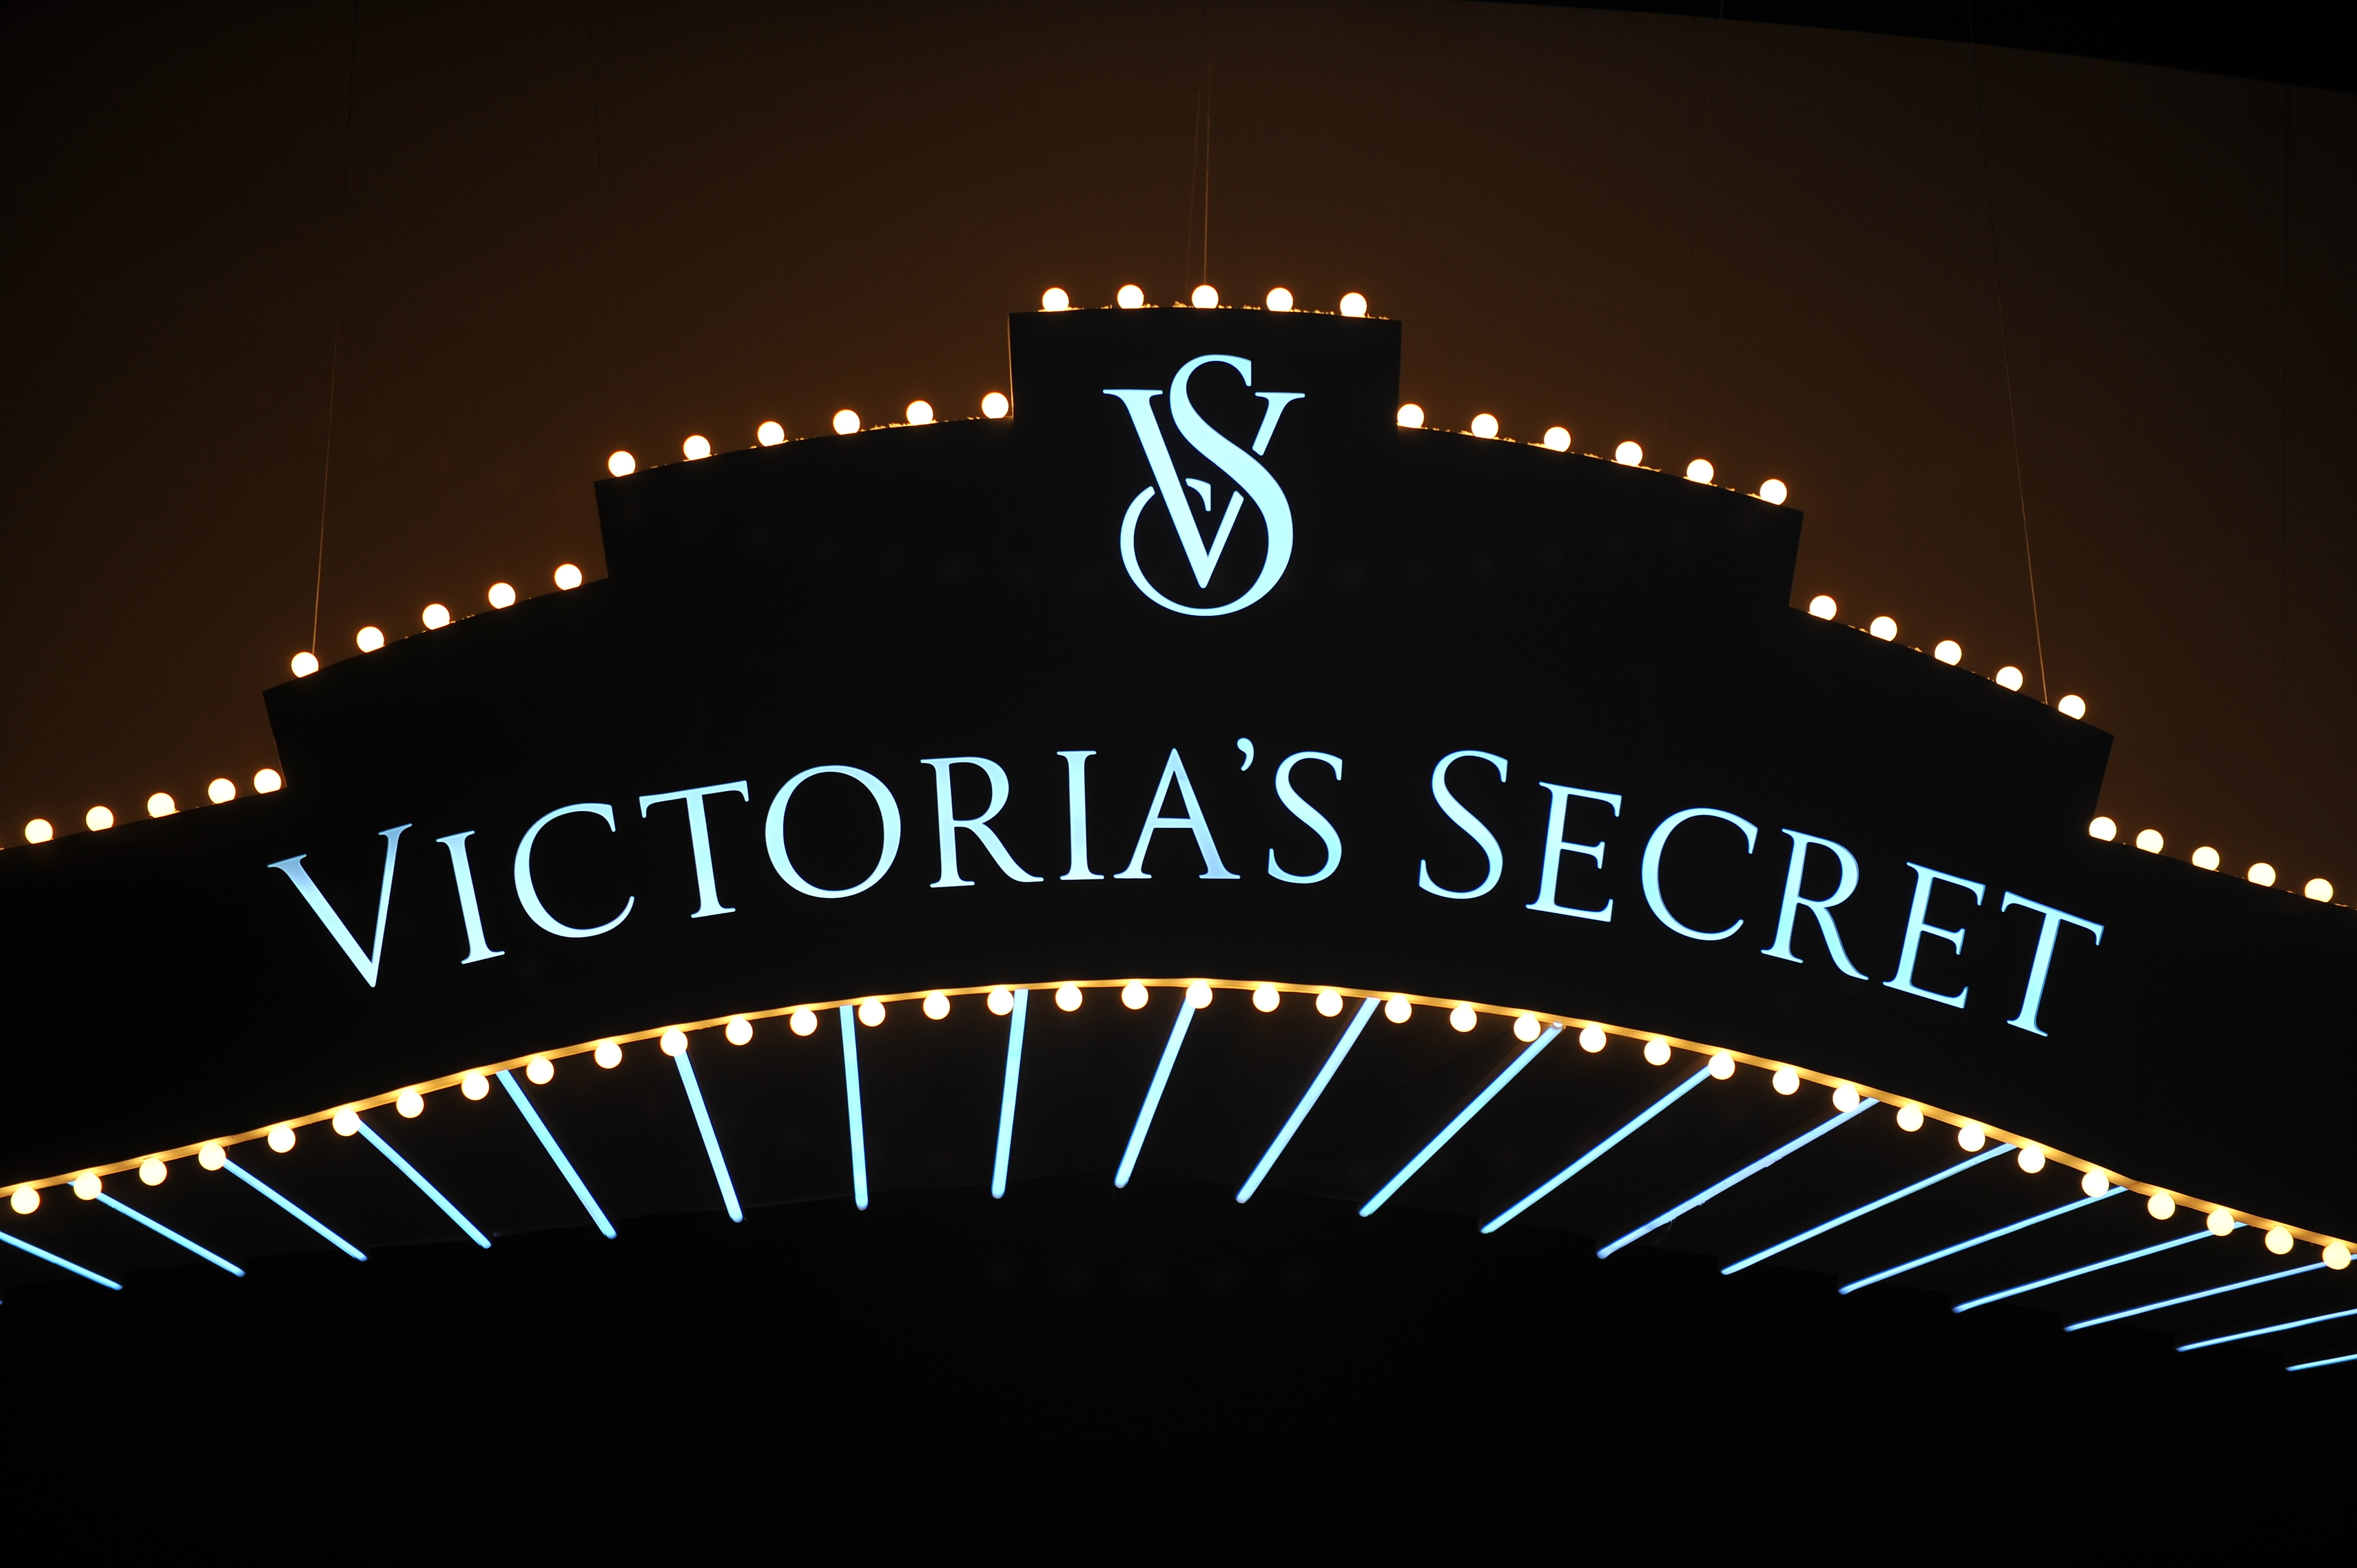 victorias secret vs logo